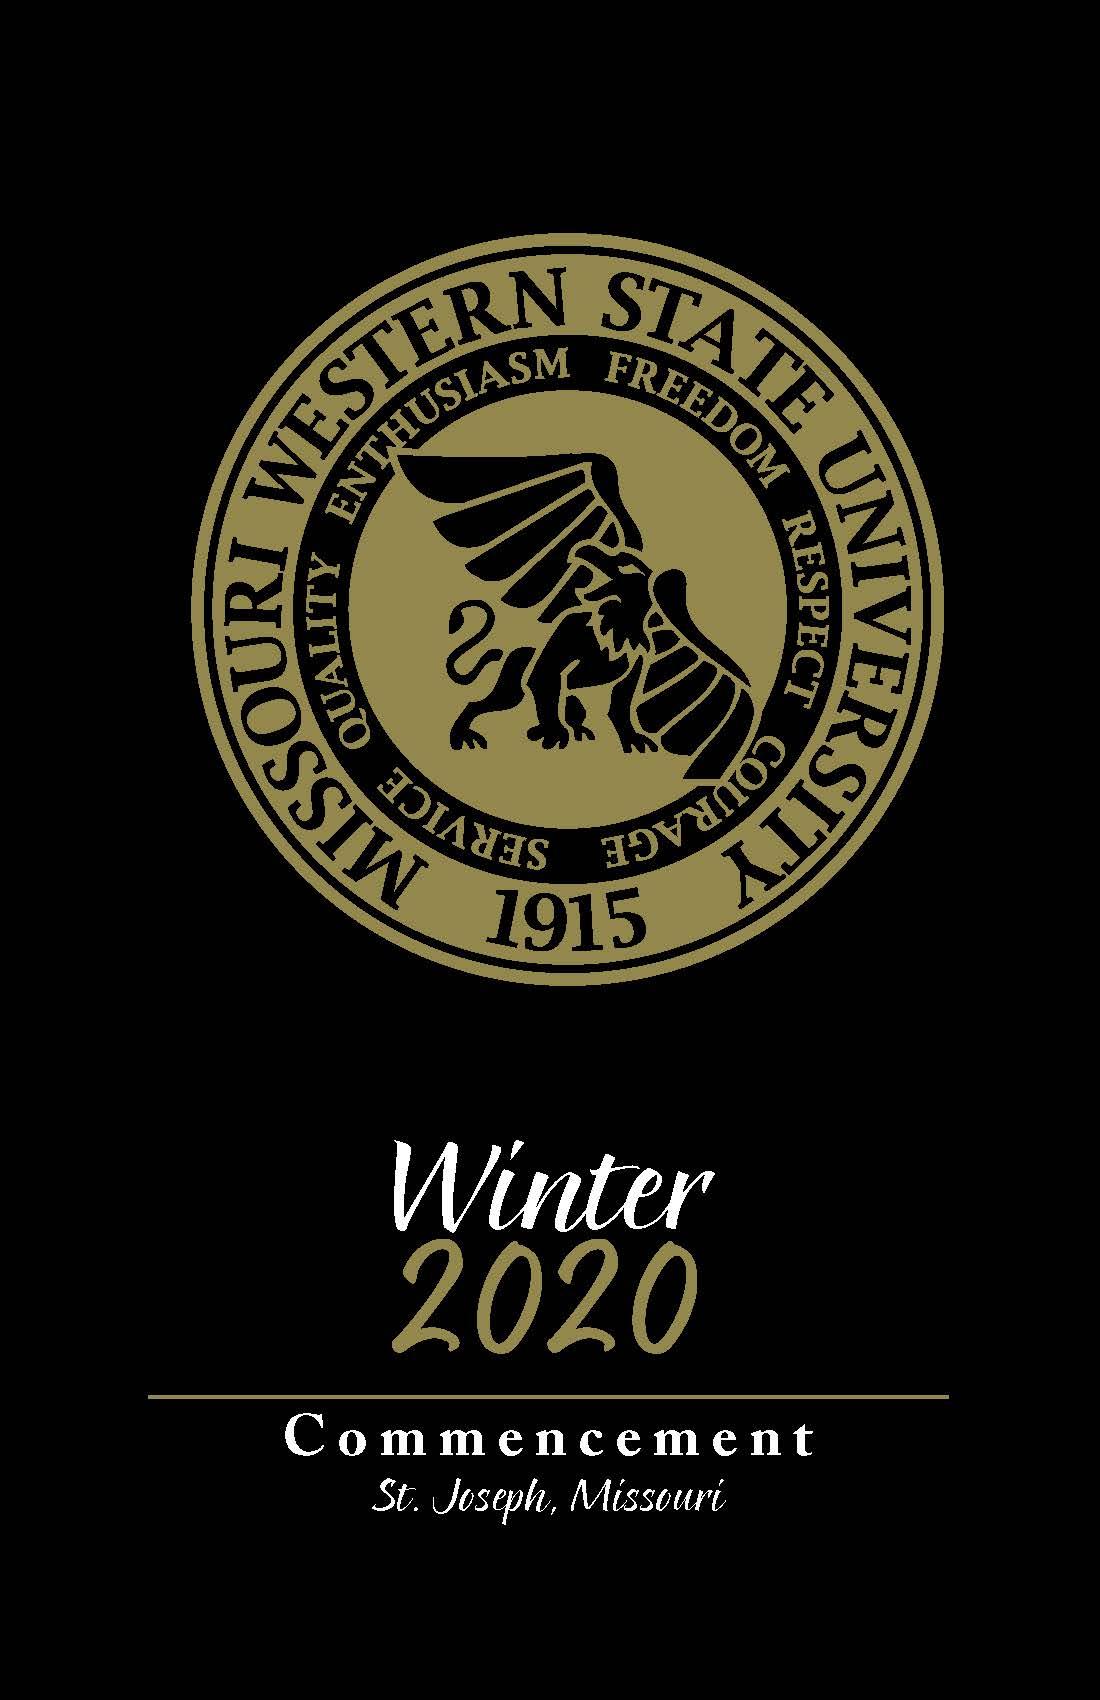 Winter 2020 Commencement Program